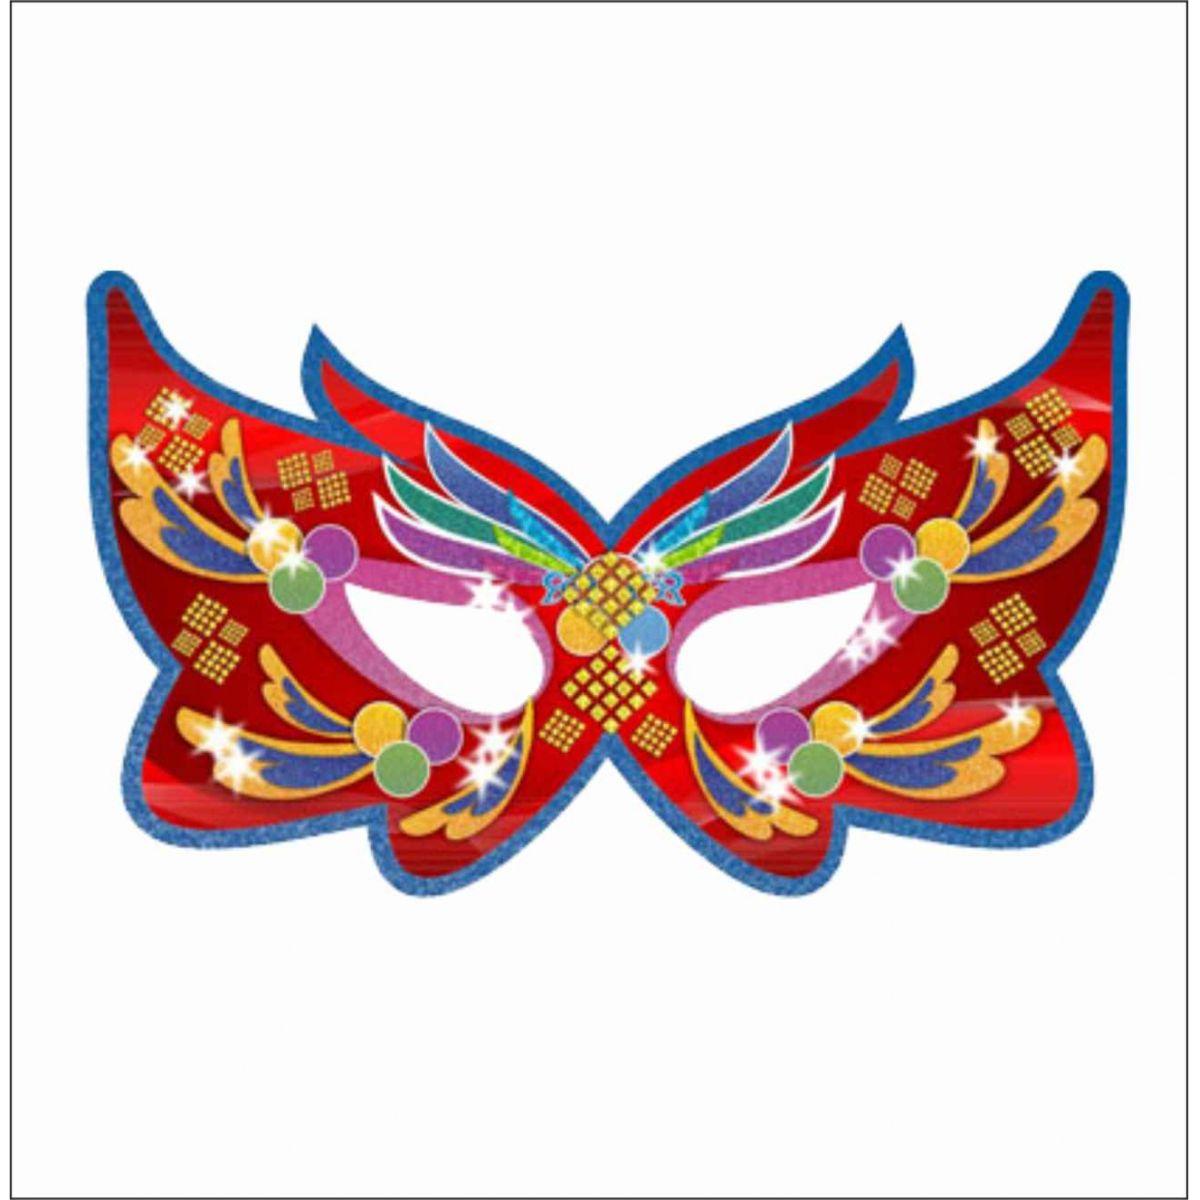 M bile m scara carnaval 62x92cm cartazbr - Mascaras para carnaval ...